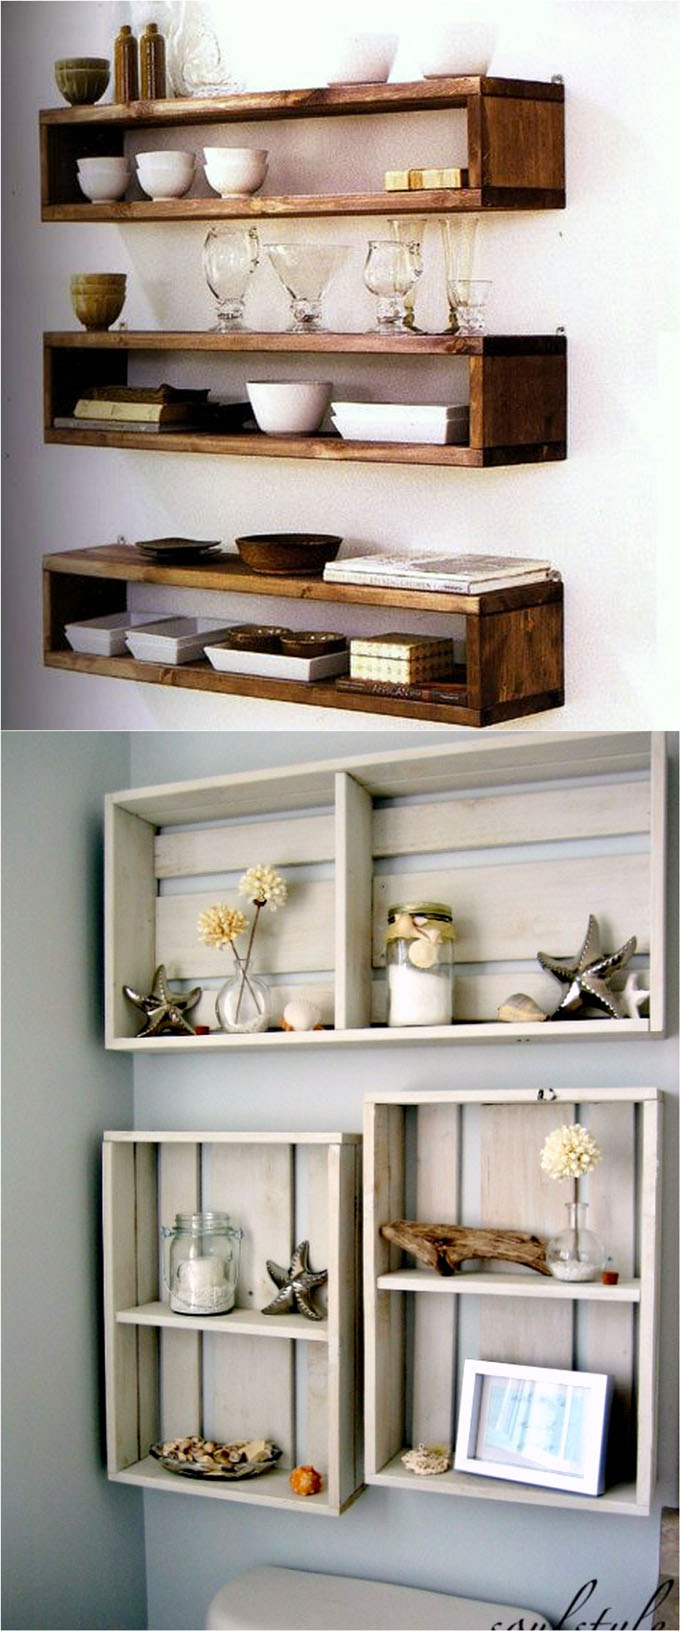 Cosmopolitan Diy Floating Shelves Ideas Diy Floating Shelves Ideas Diy Ideas Hanging Shelves Ideas Hanging Shelving Ideas interior Hanging Shelves Ideas